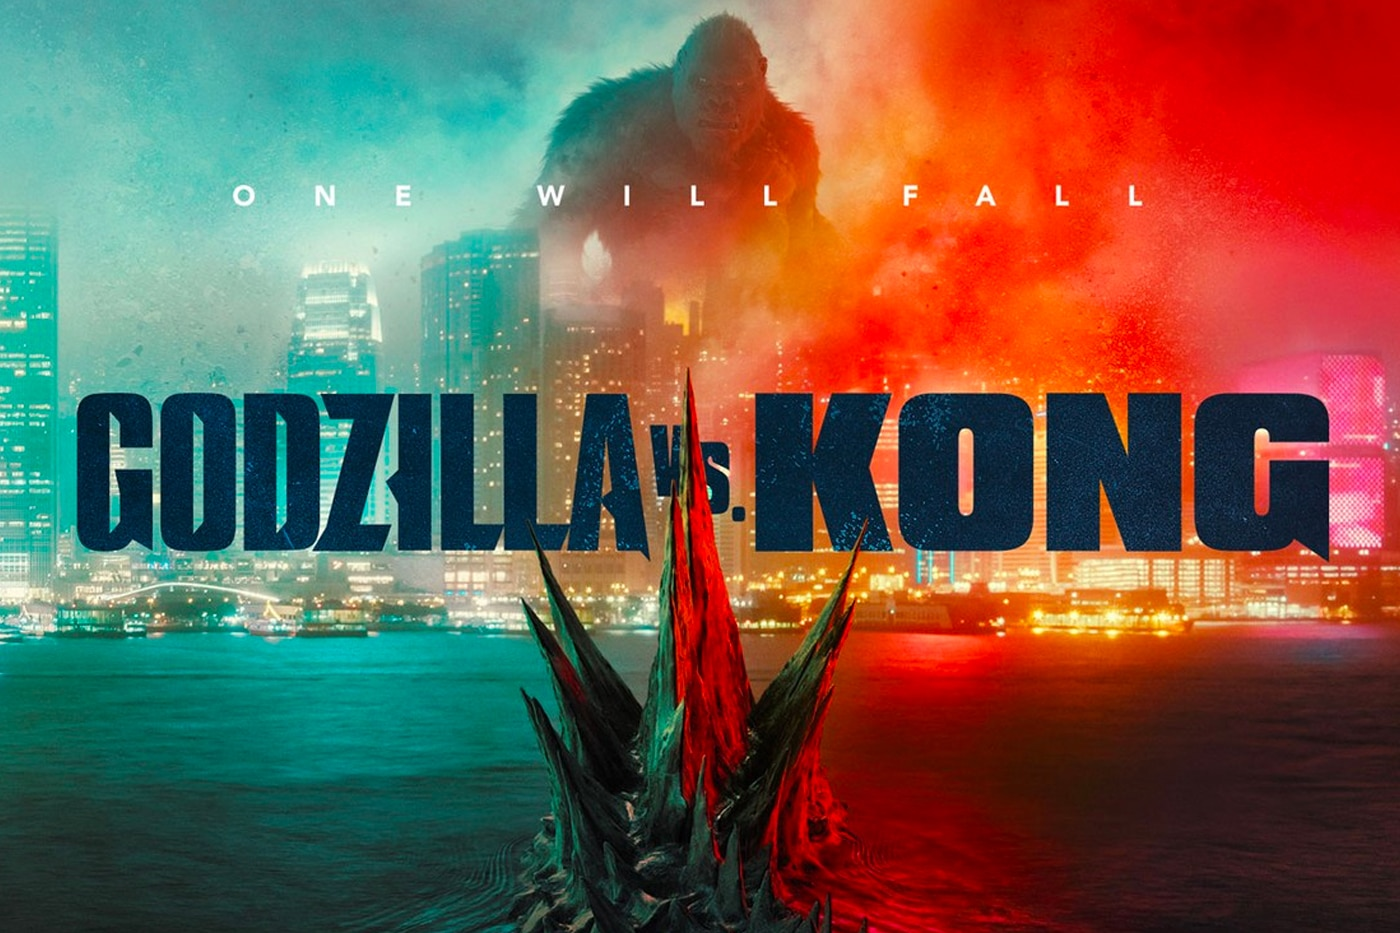 Godzilla vs. Kong-trailer